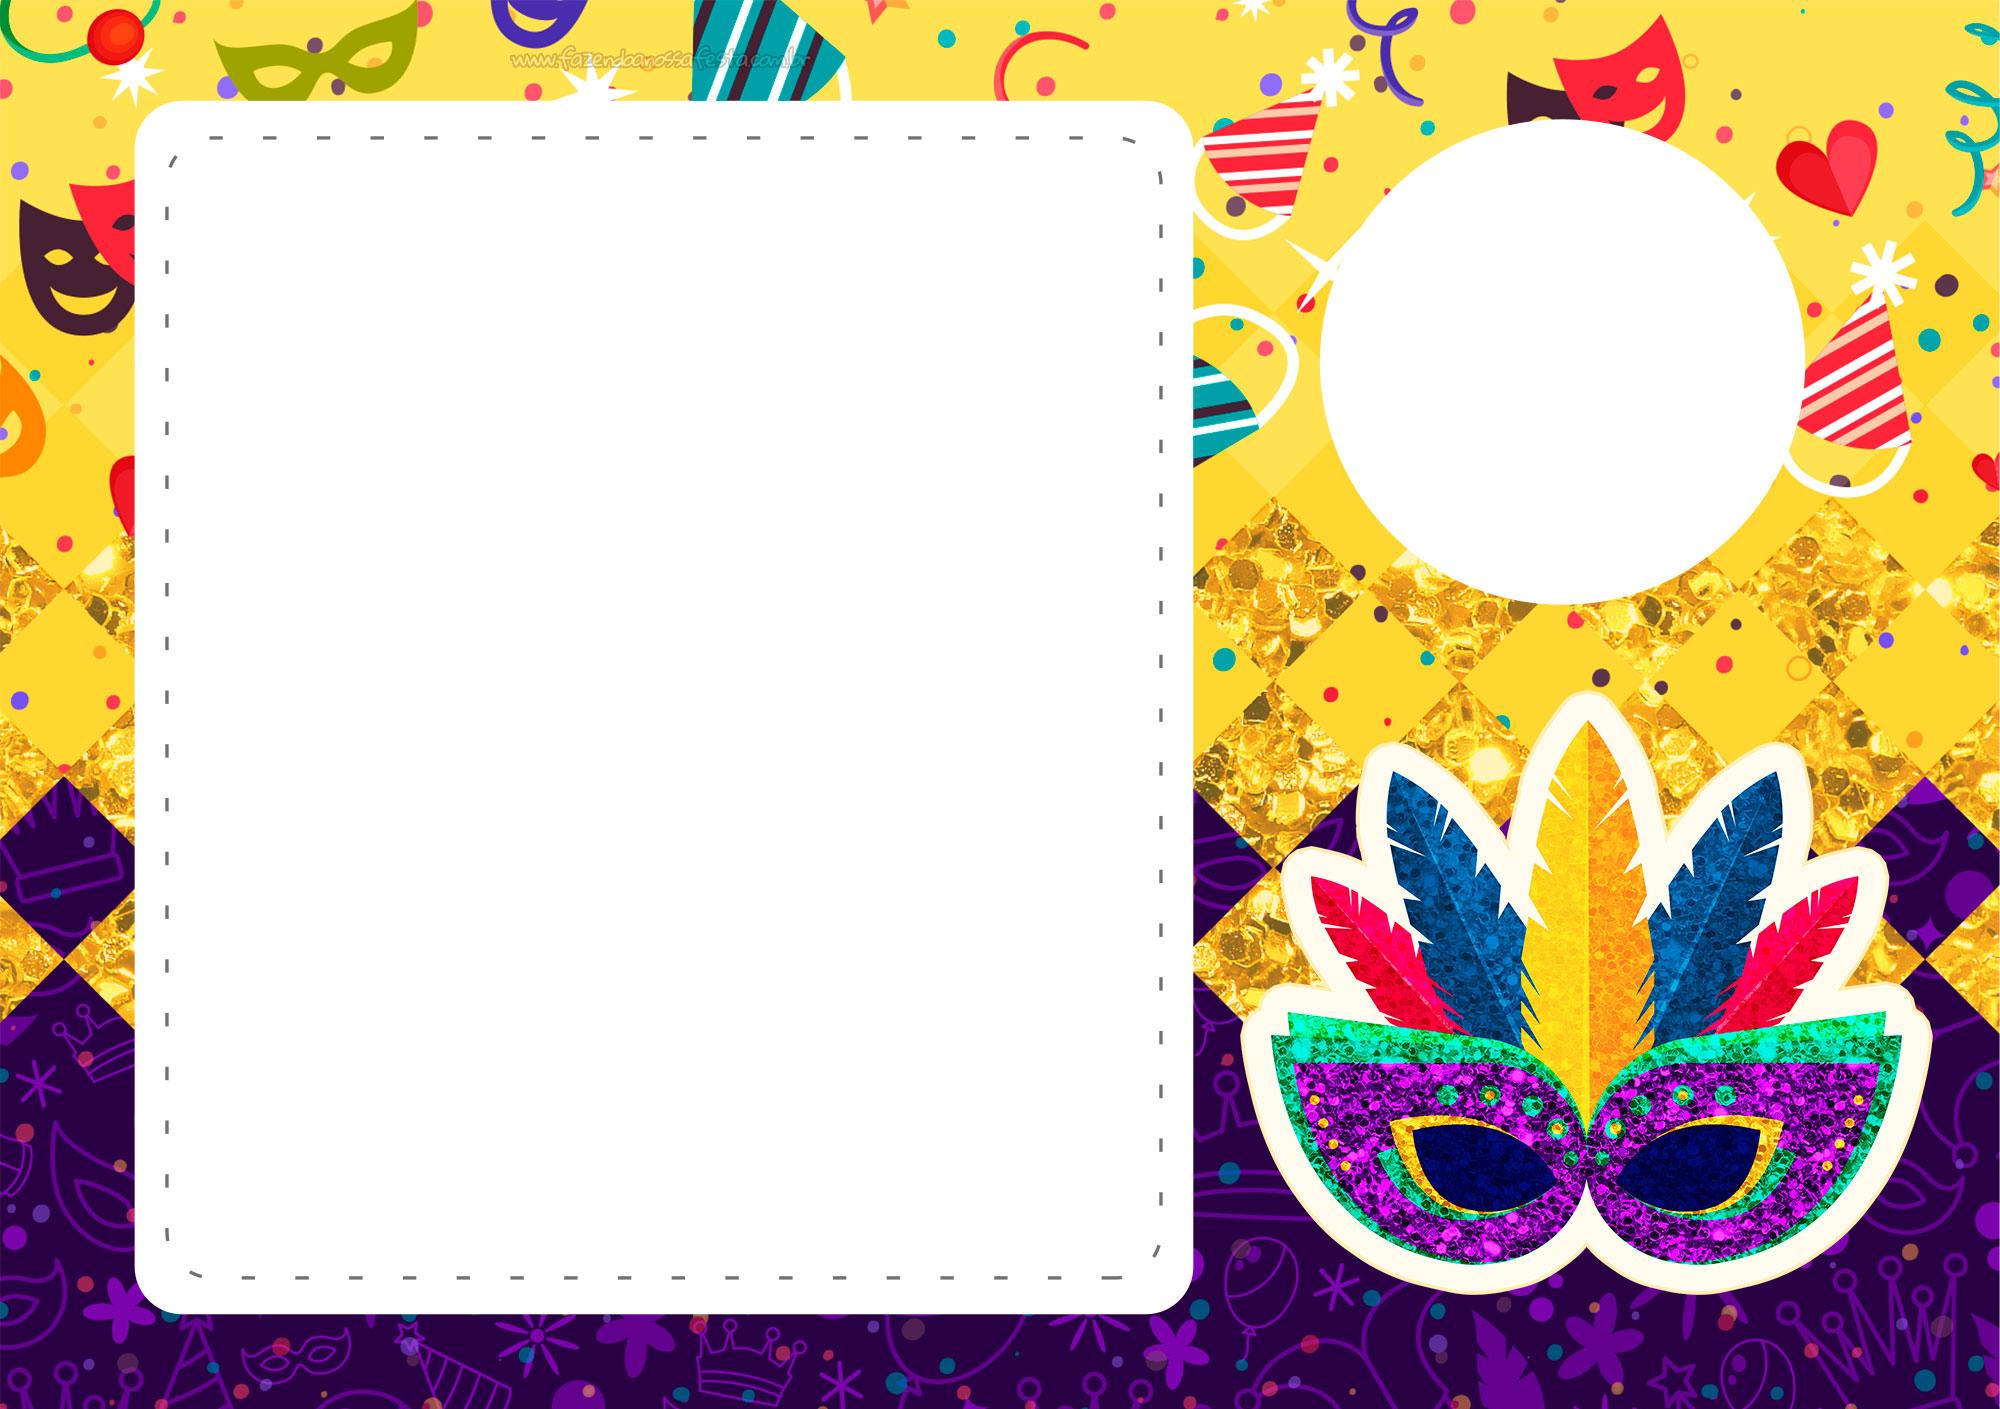 Convite com Foto de Carnaval